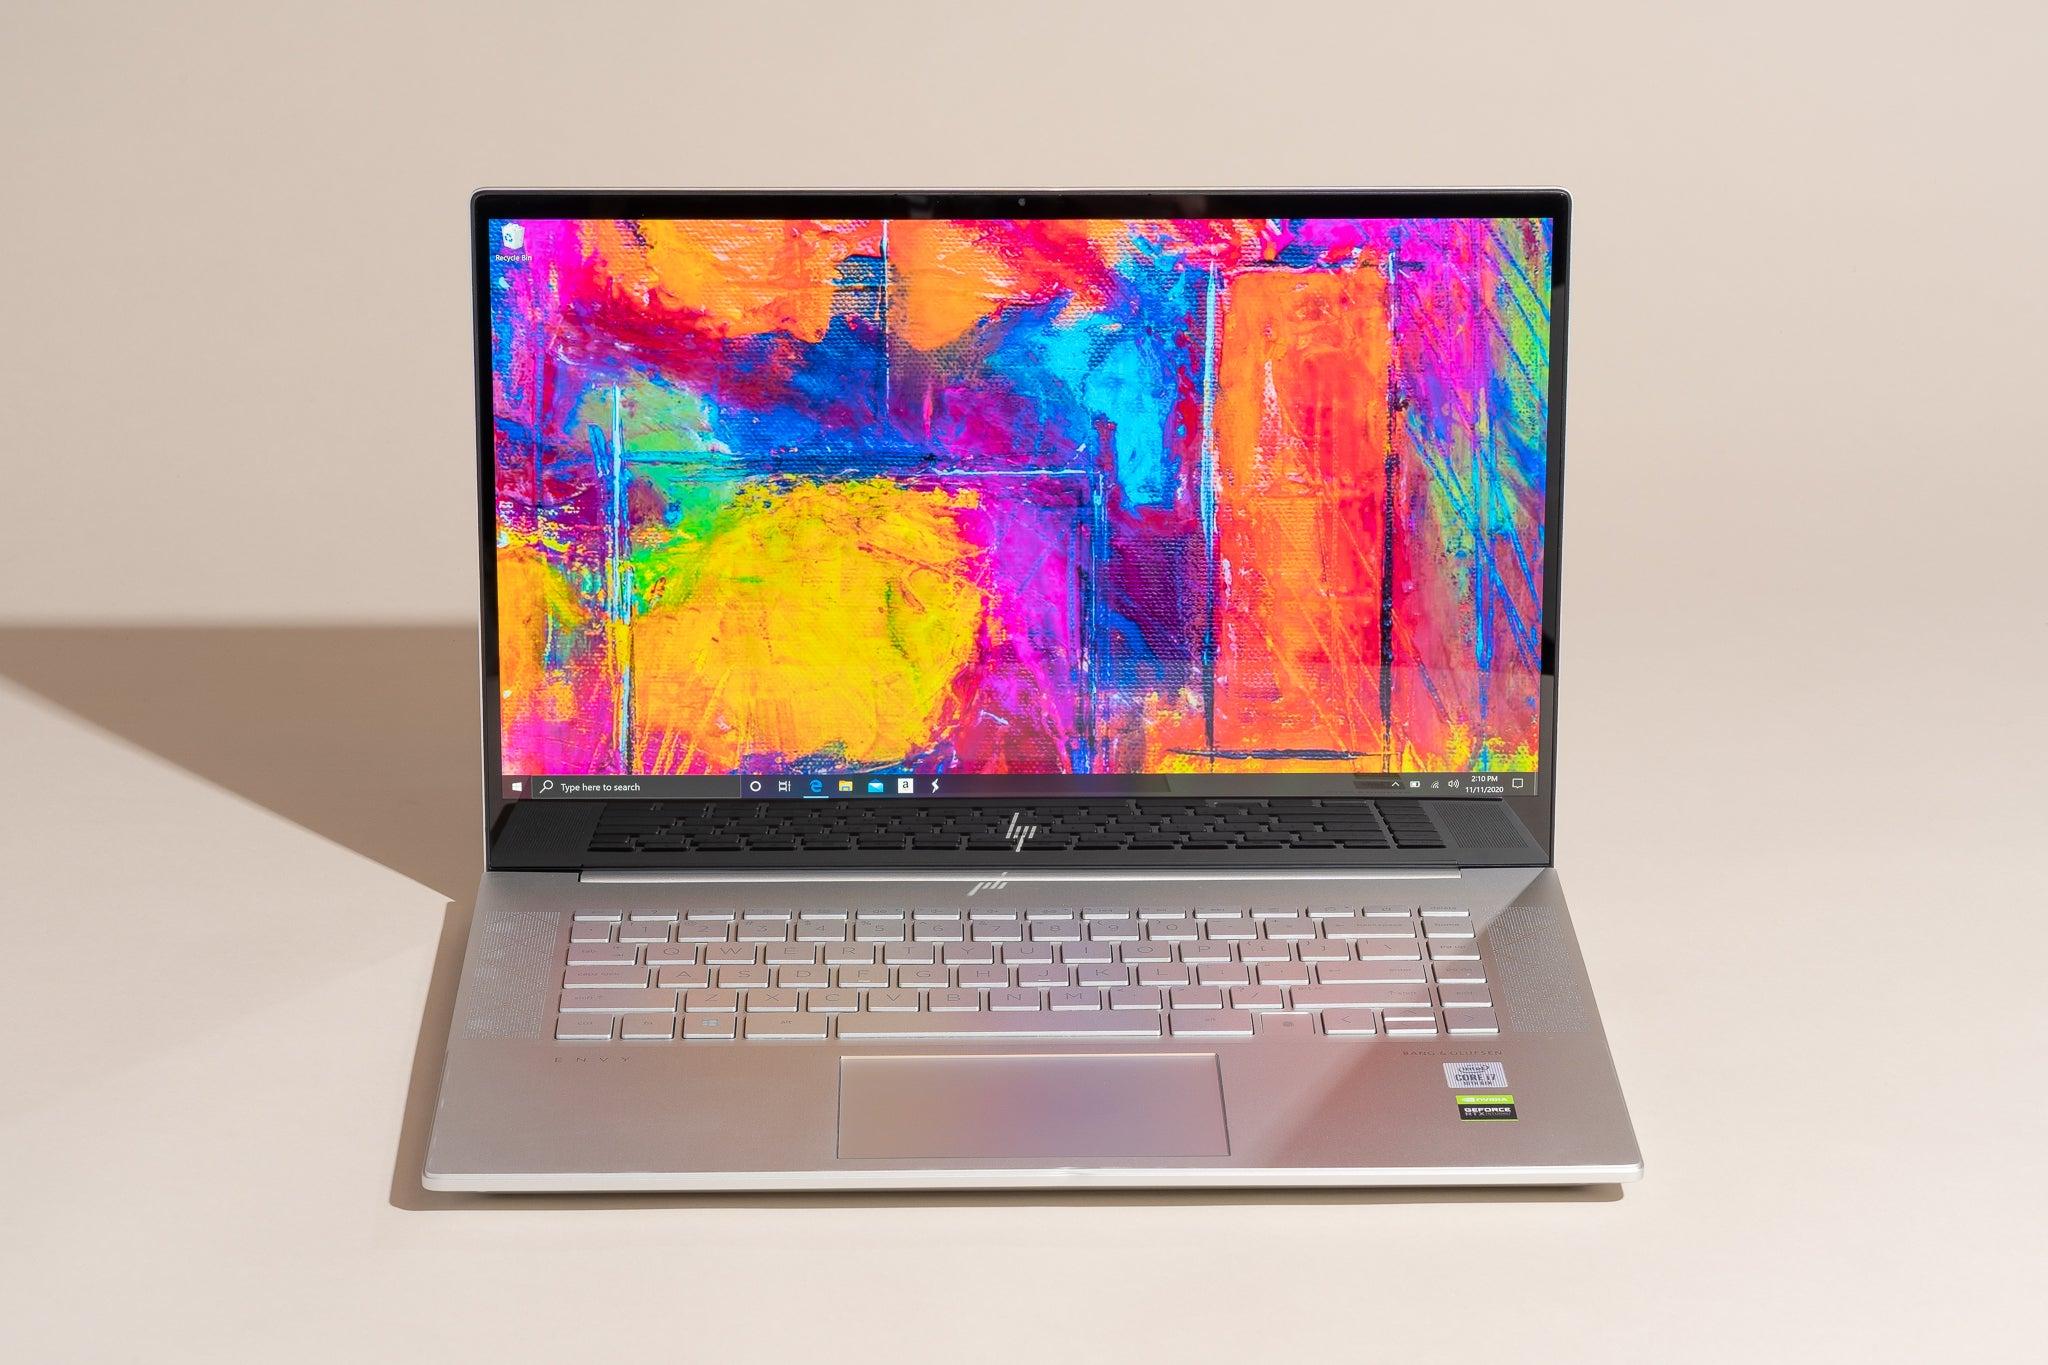 Best Laptop for Poor Mom